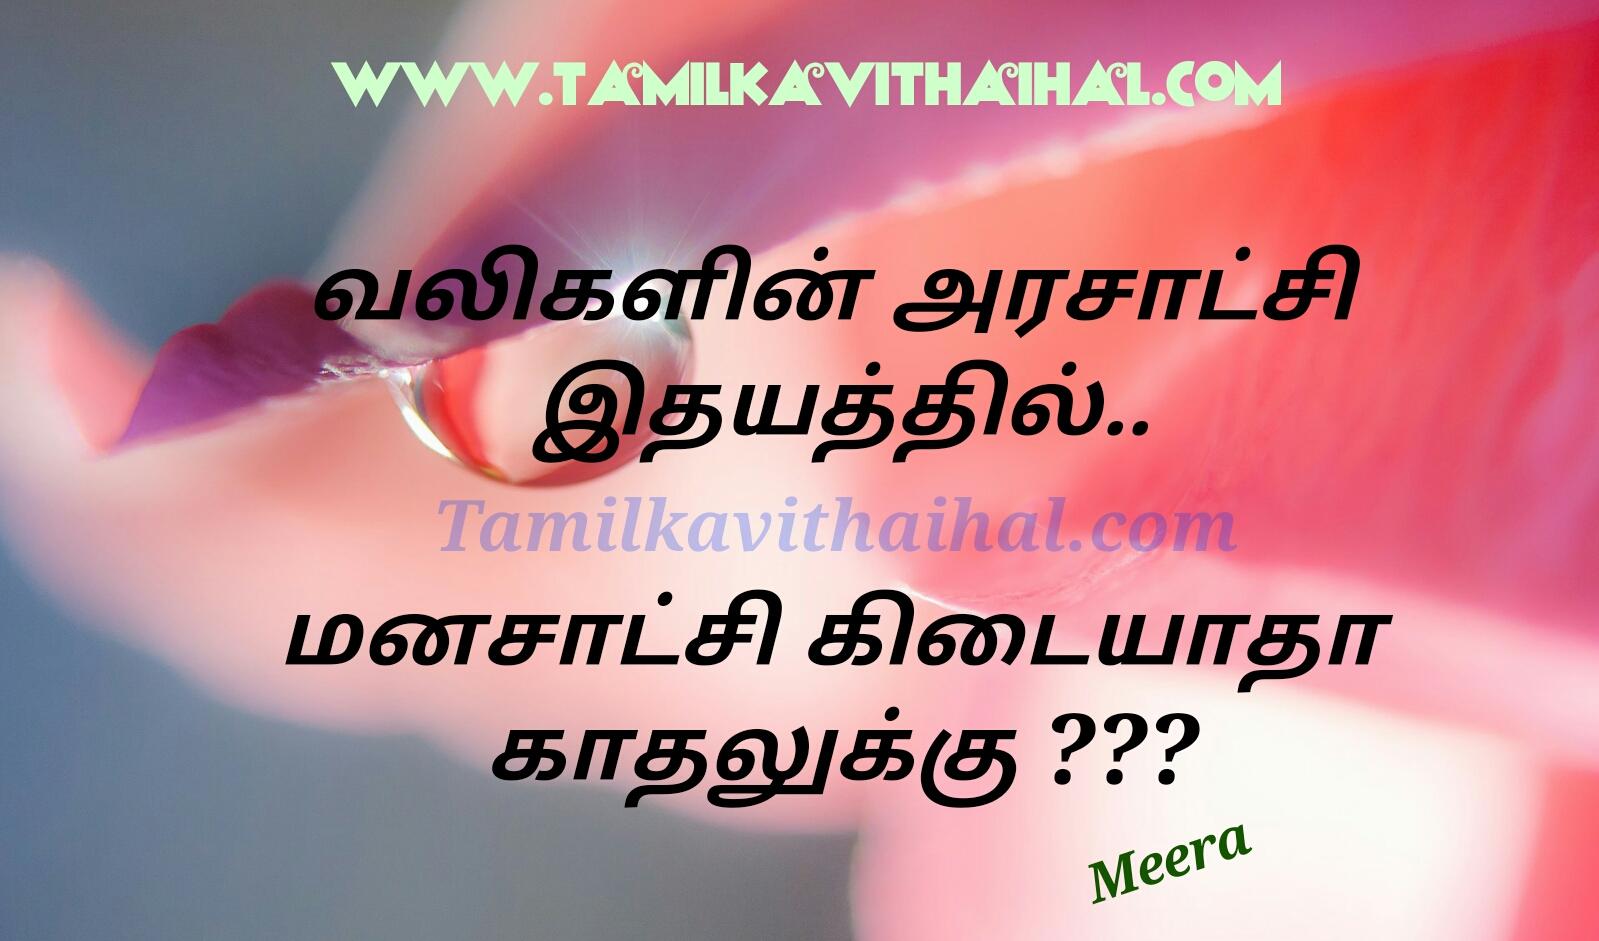 Beautiful explain for vali manam kadhal ranam kanner kavithai lovr meera soham poem gallery pic